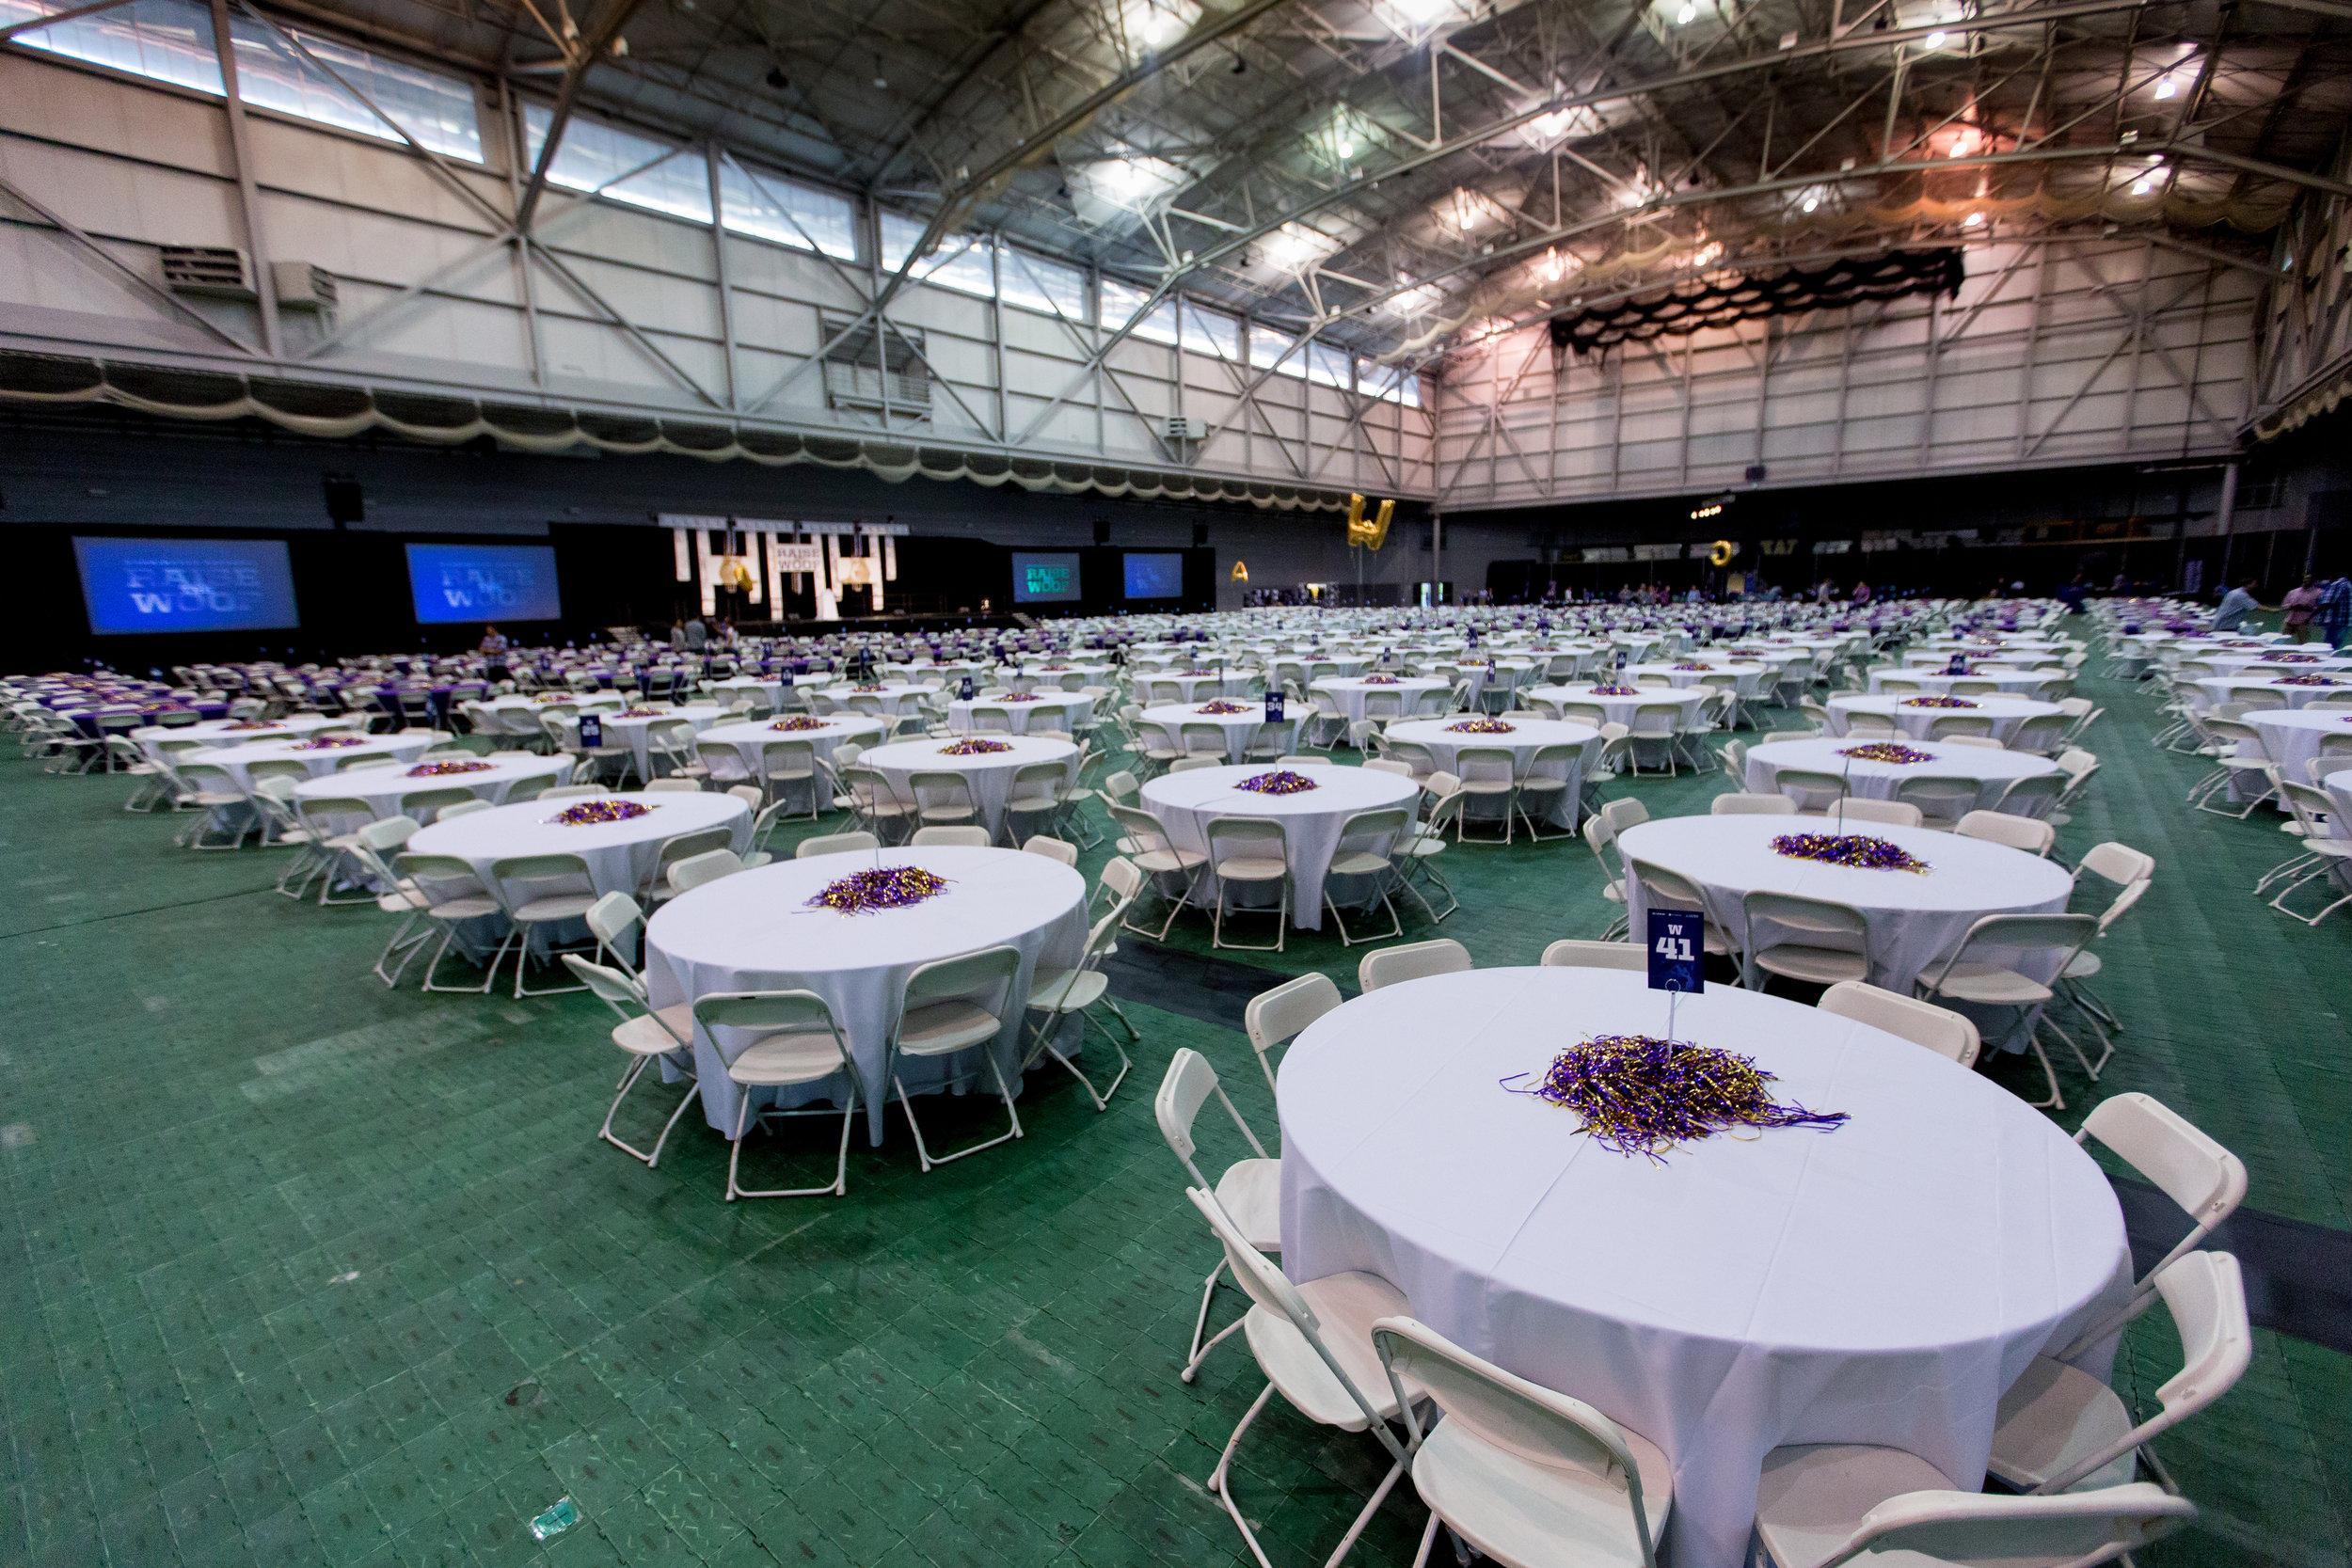 University of Washington ICA Special Events